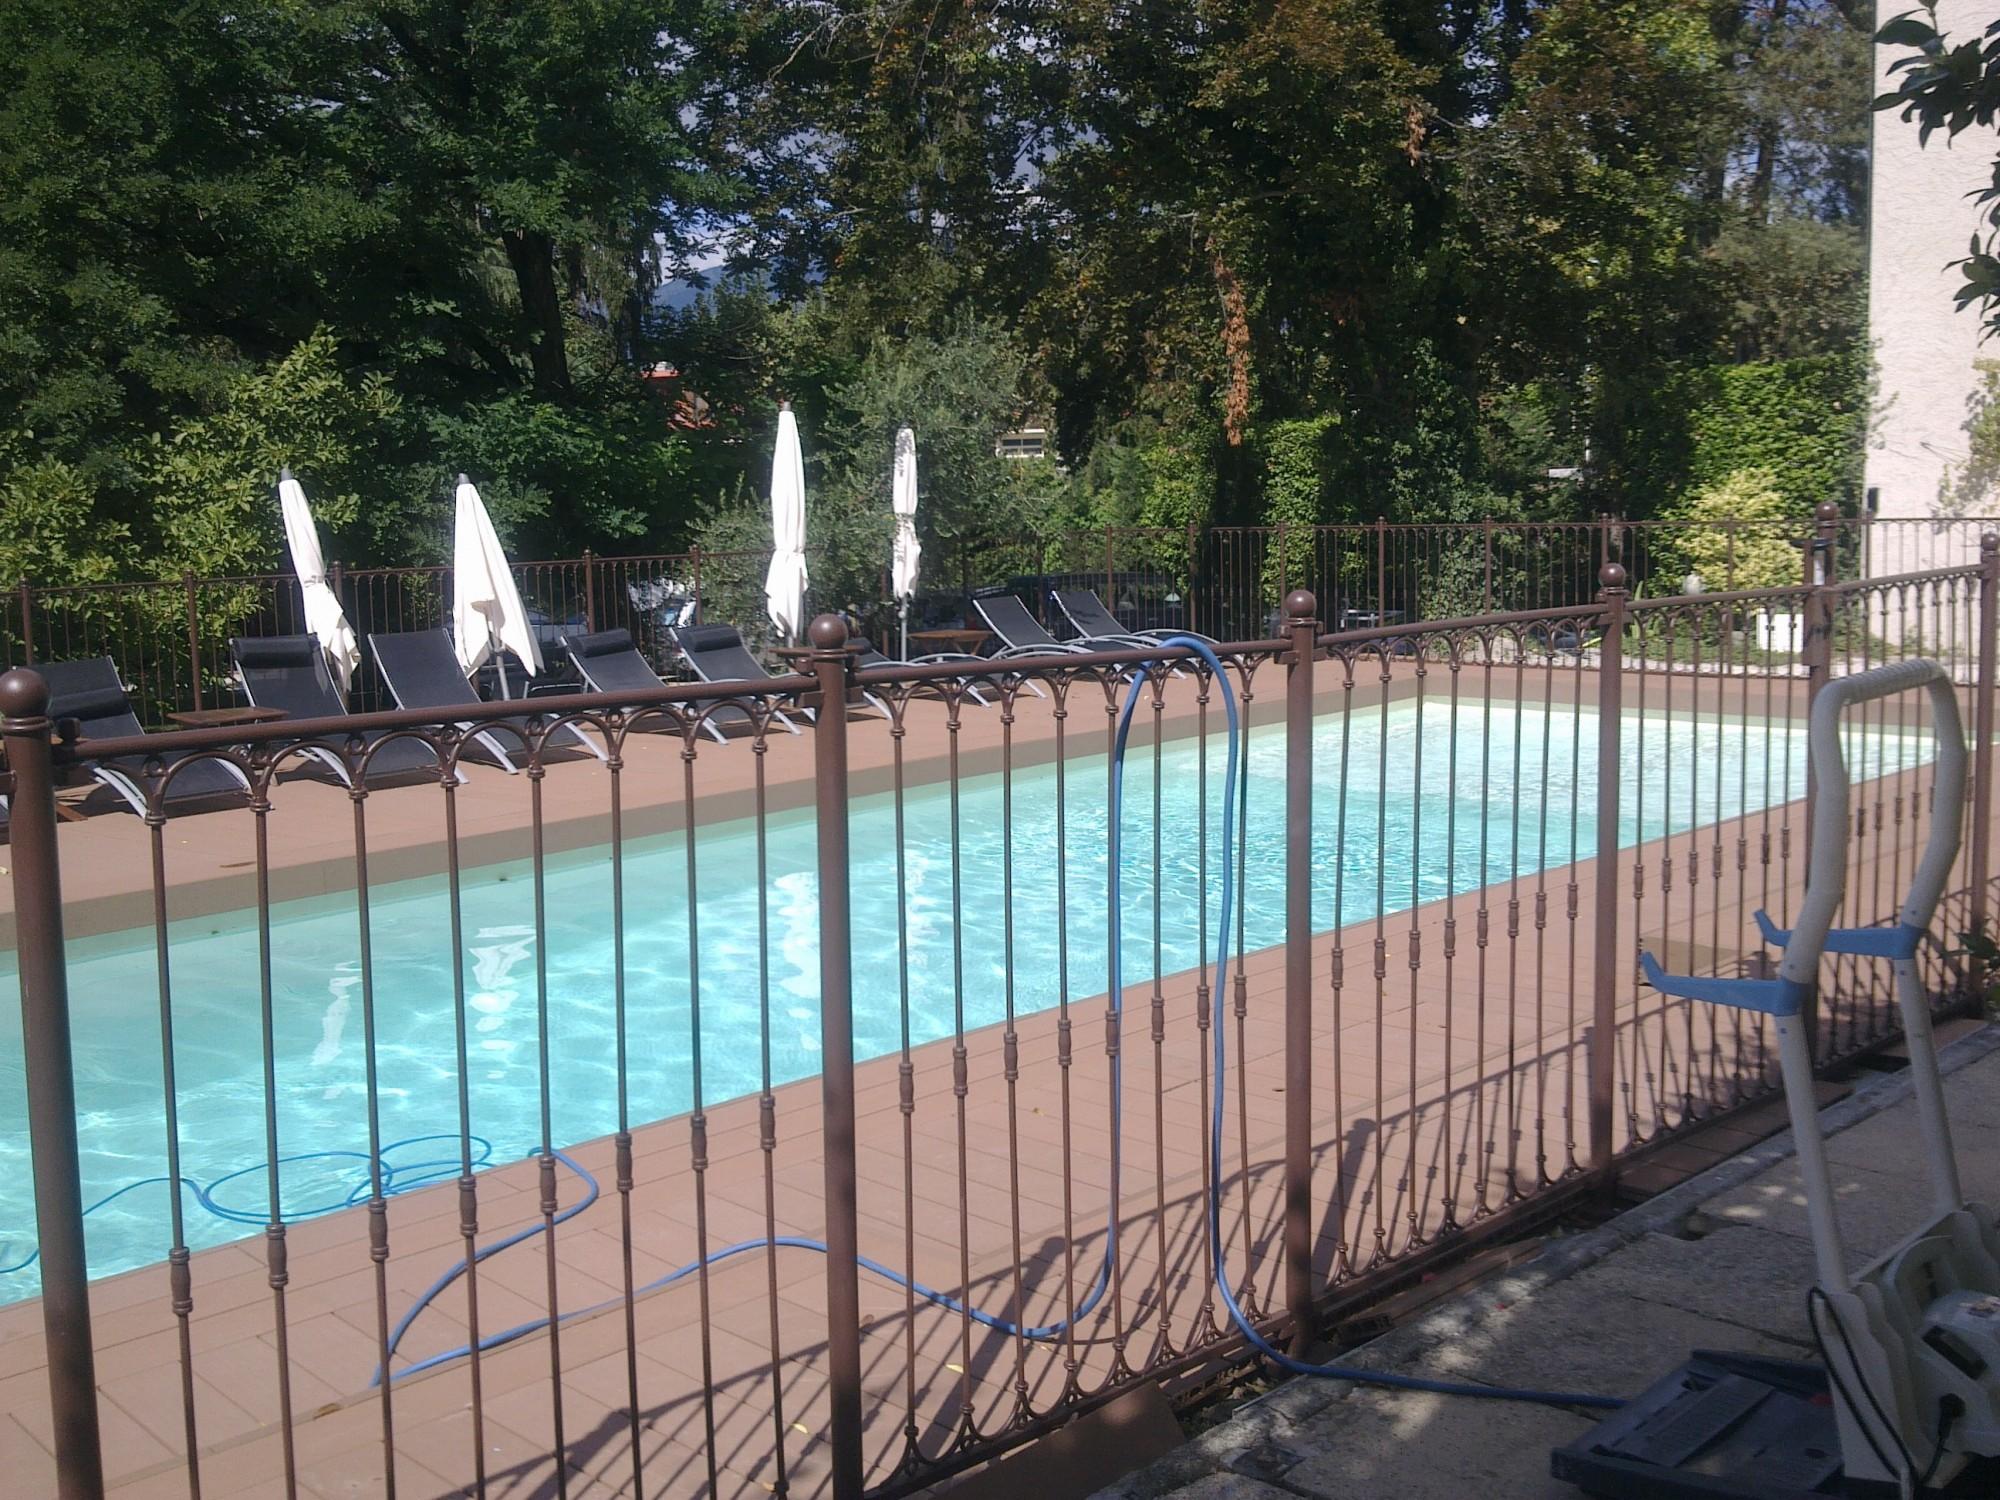 Prix Piscine Aquilus Mini Water fonctionnement d'une piscine - mini piscine comprendre et